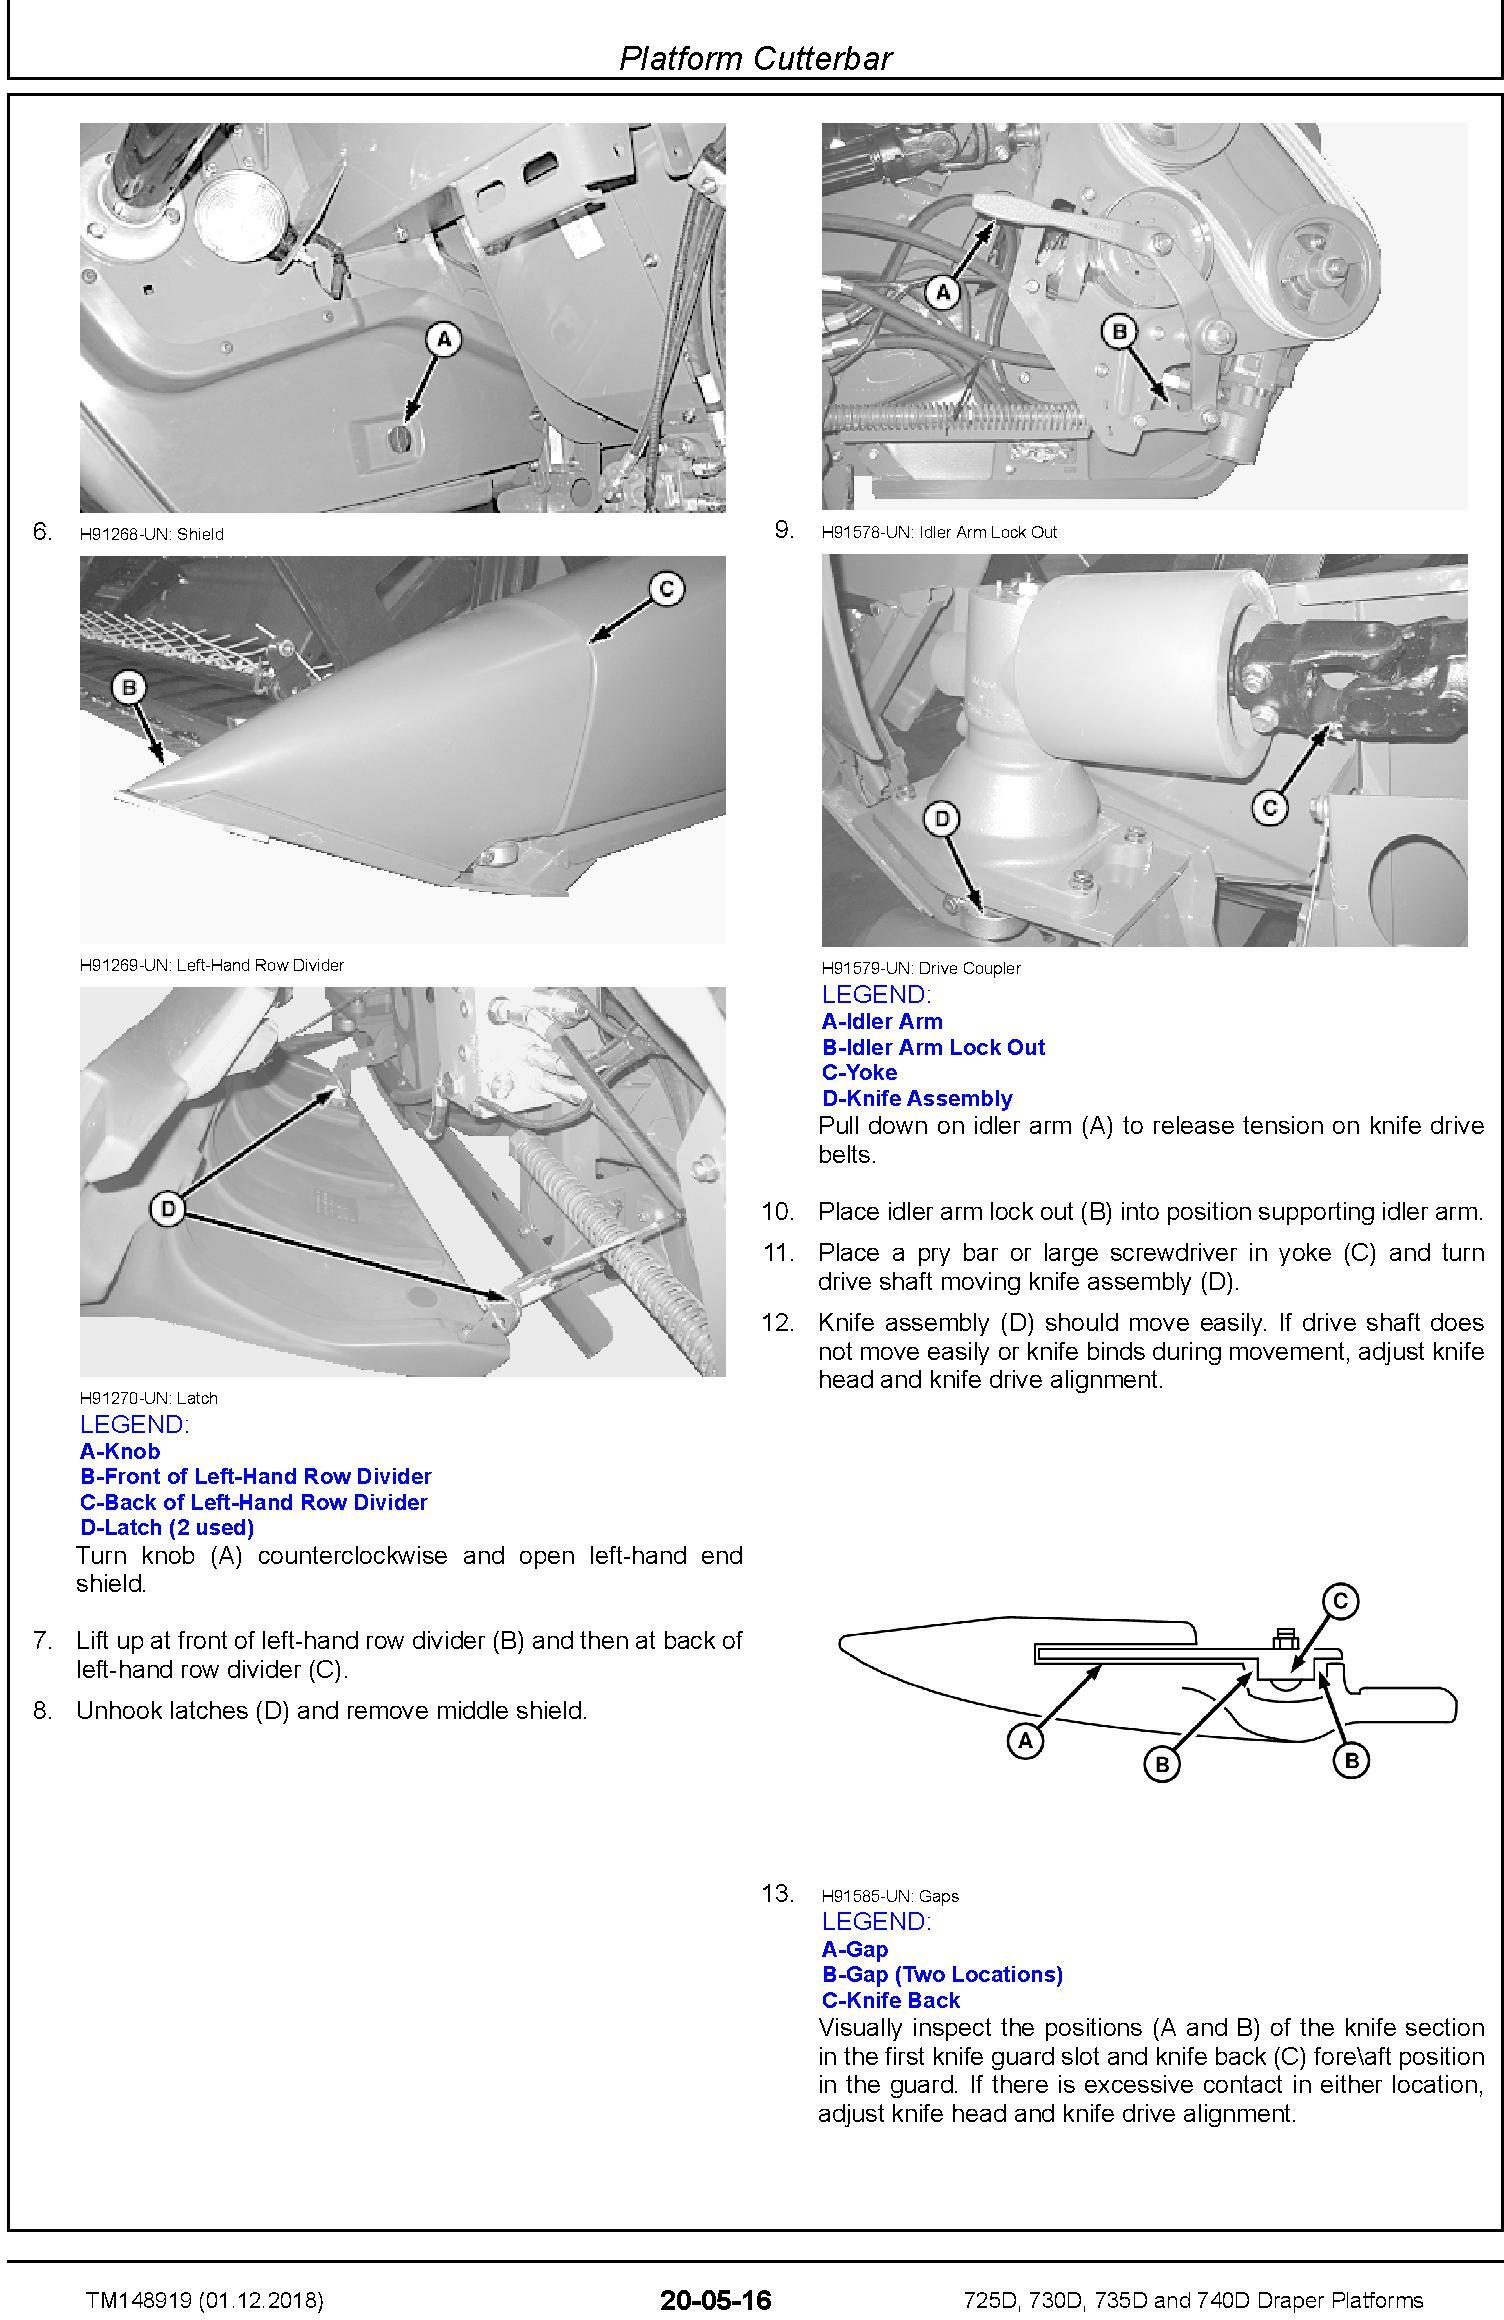 John Deere 725D, 730D, 735D and 740D Draper Platforms Repair Technical Service Manual (TM148919) - 1